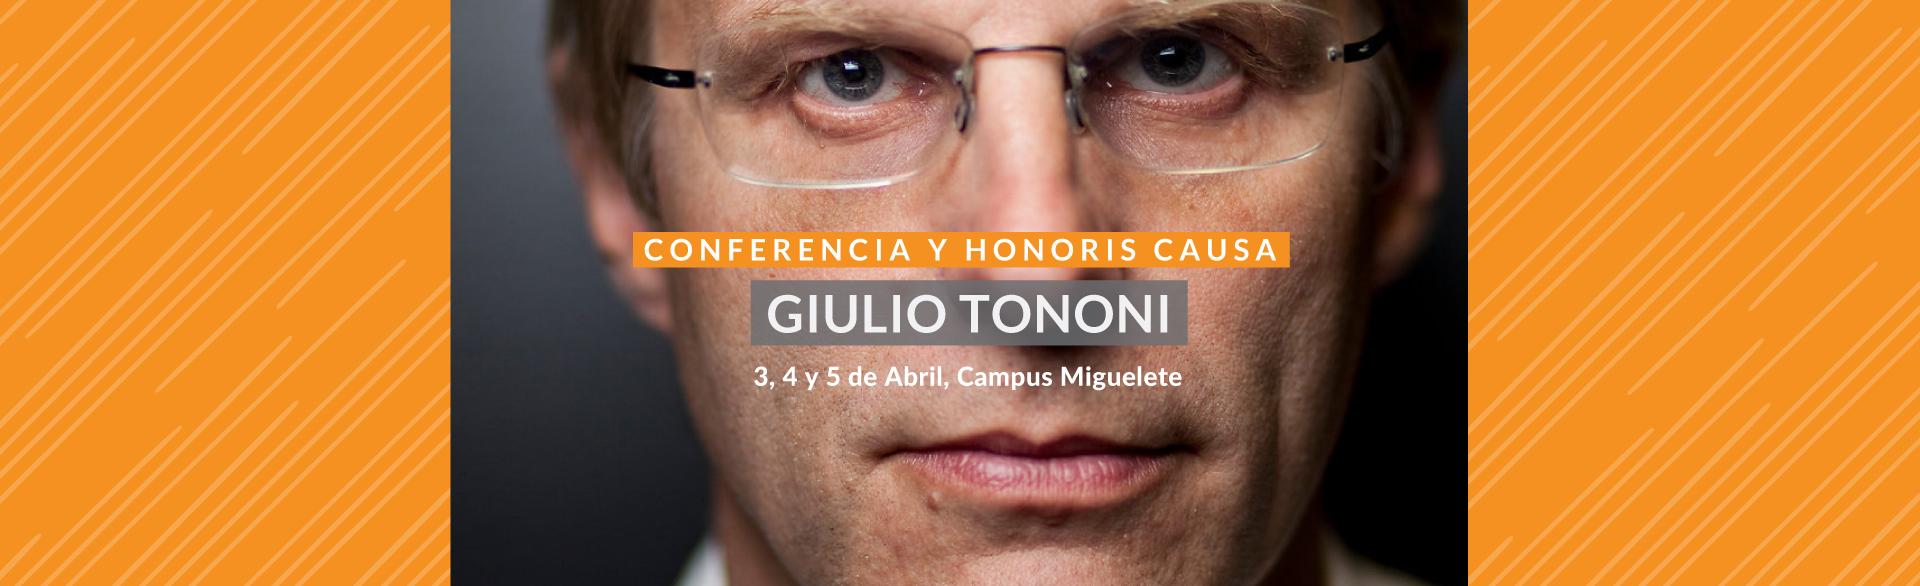 Giulio Tononi en la Argentina